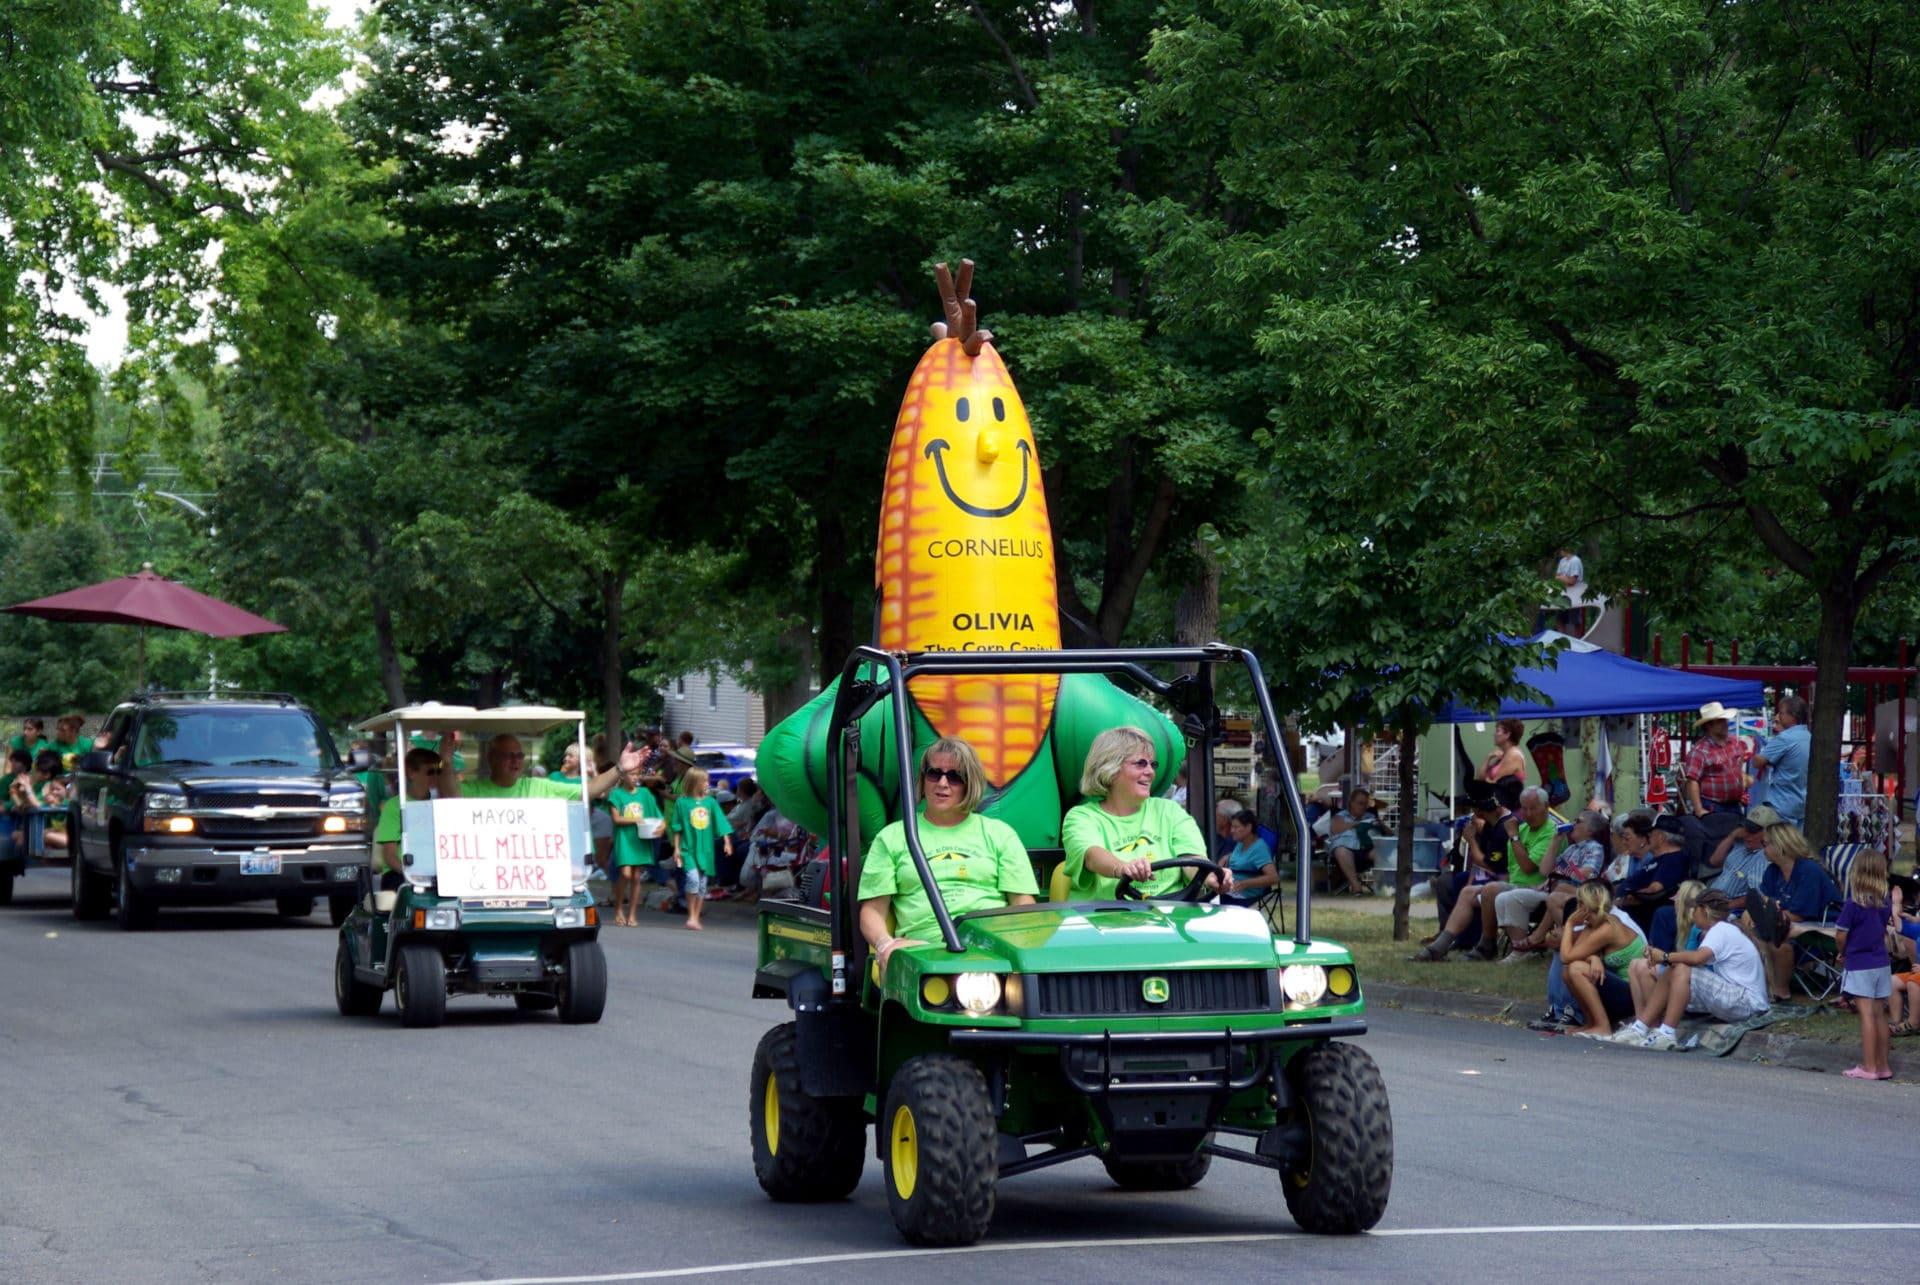 Cornellus the Sweet Corn Mascot